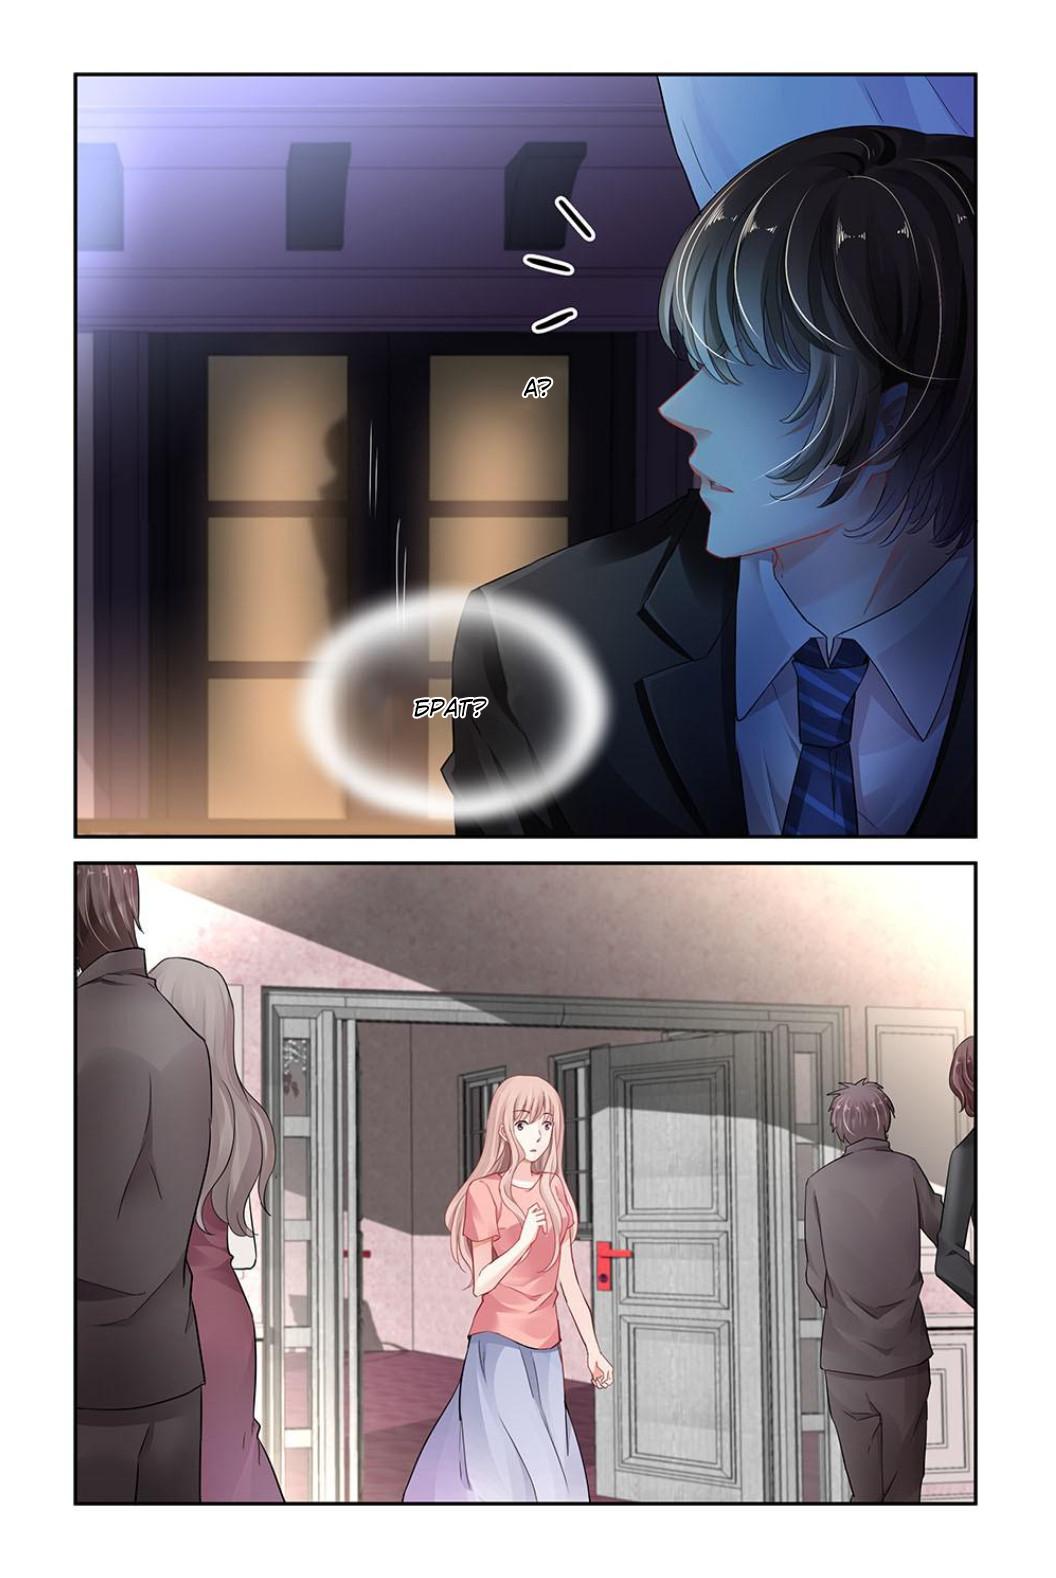 https://r1.ninemanga.com/comics/pic2/14/27598/284692/1455510338618.jpg Page 6